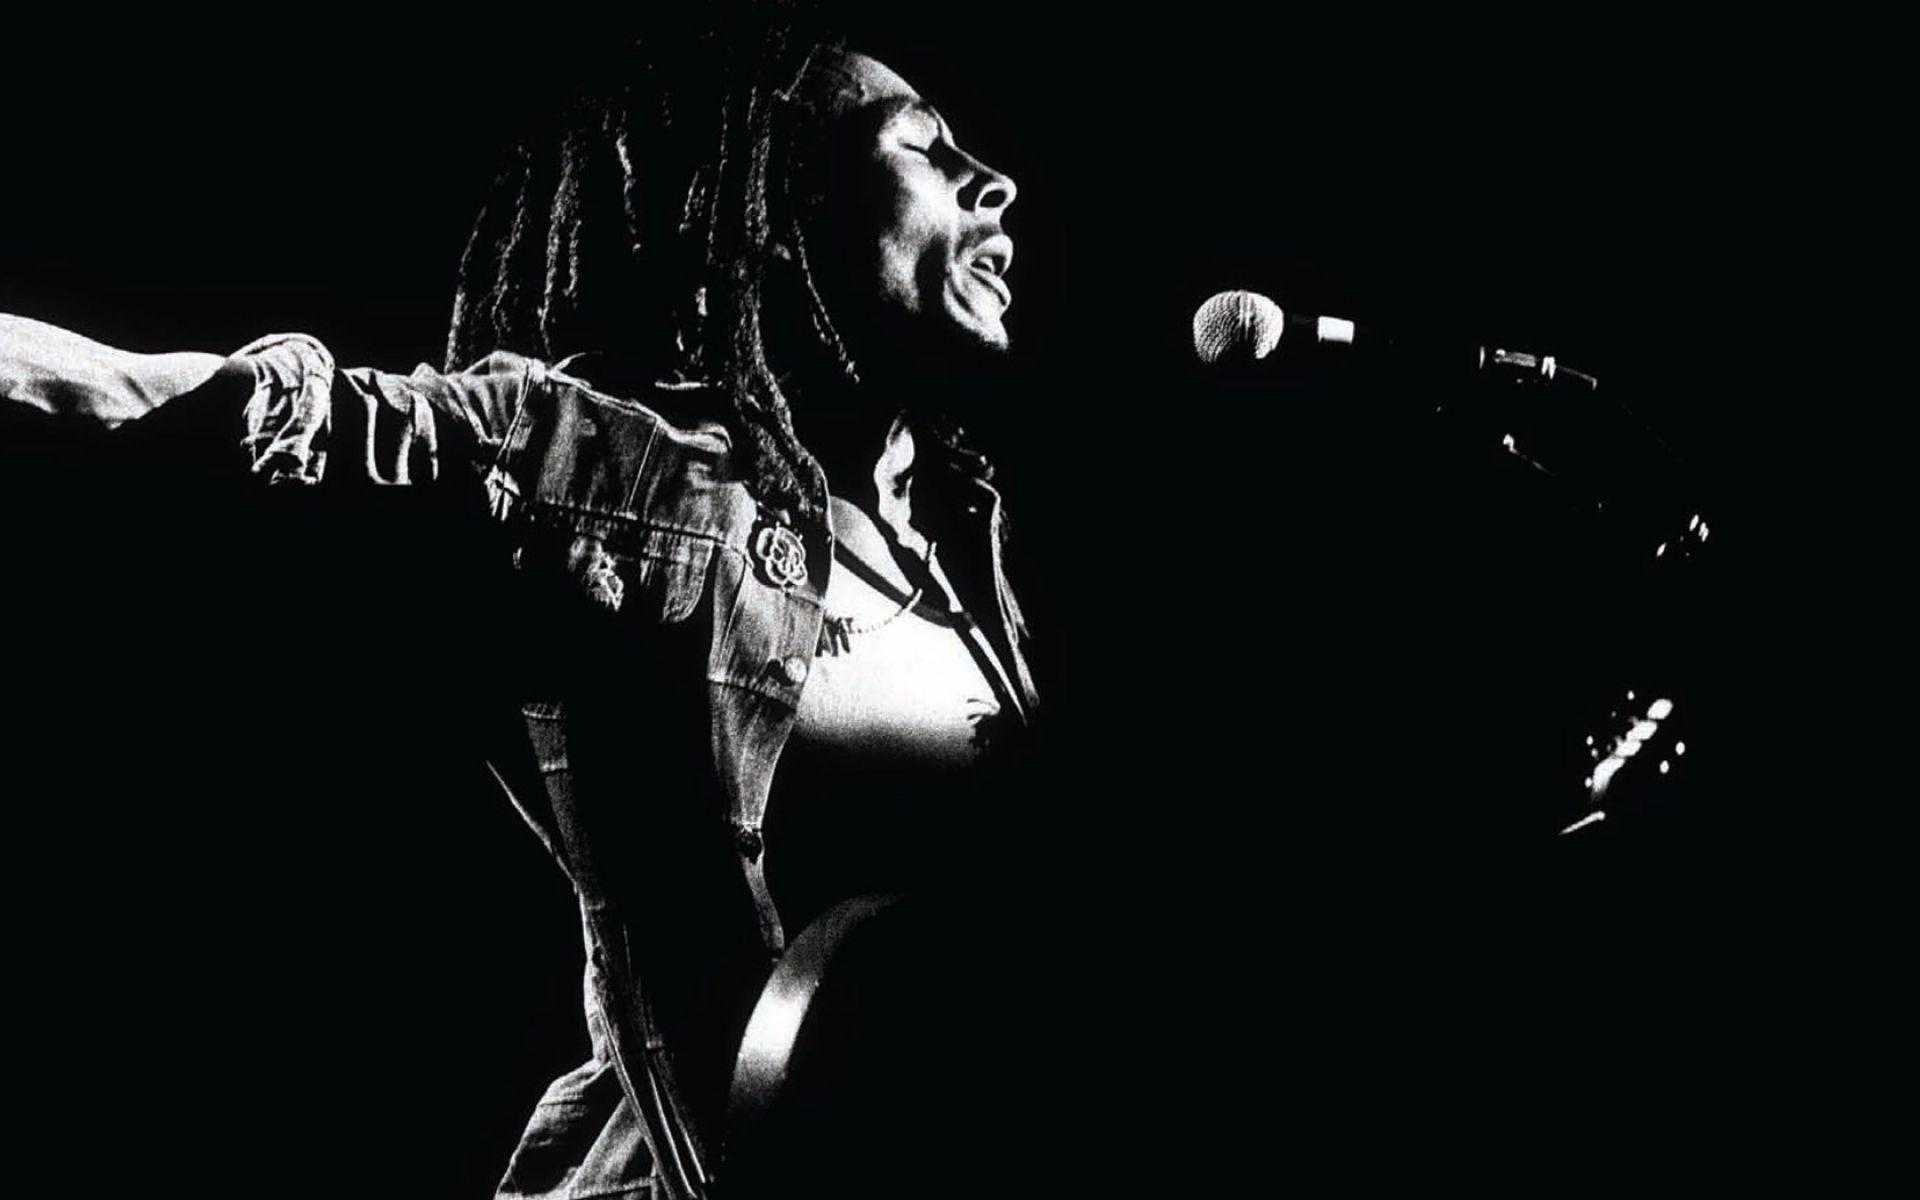 Bob Marley Wallpaper Desktop One Love : Reggae Wallpapers - Wallpaper cave